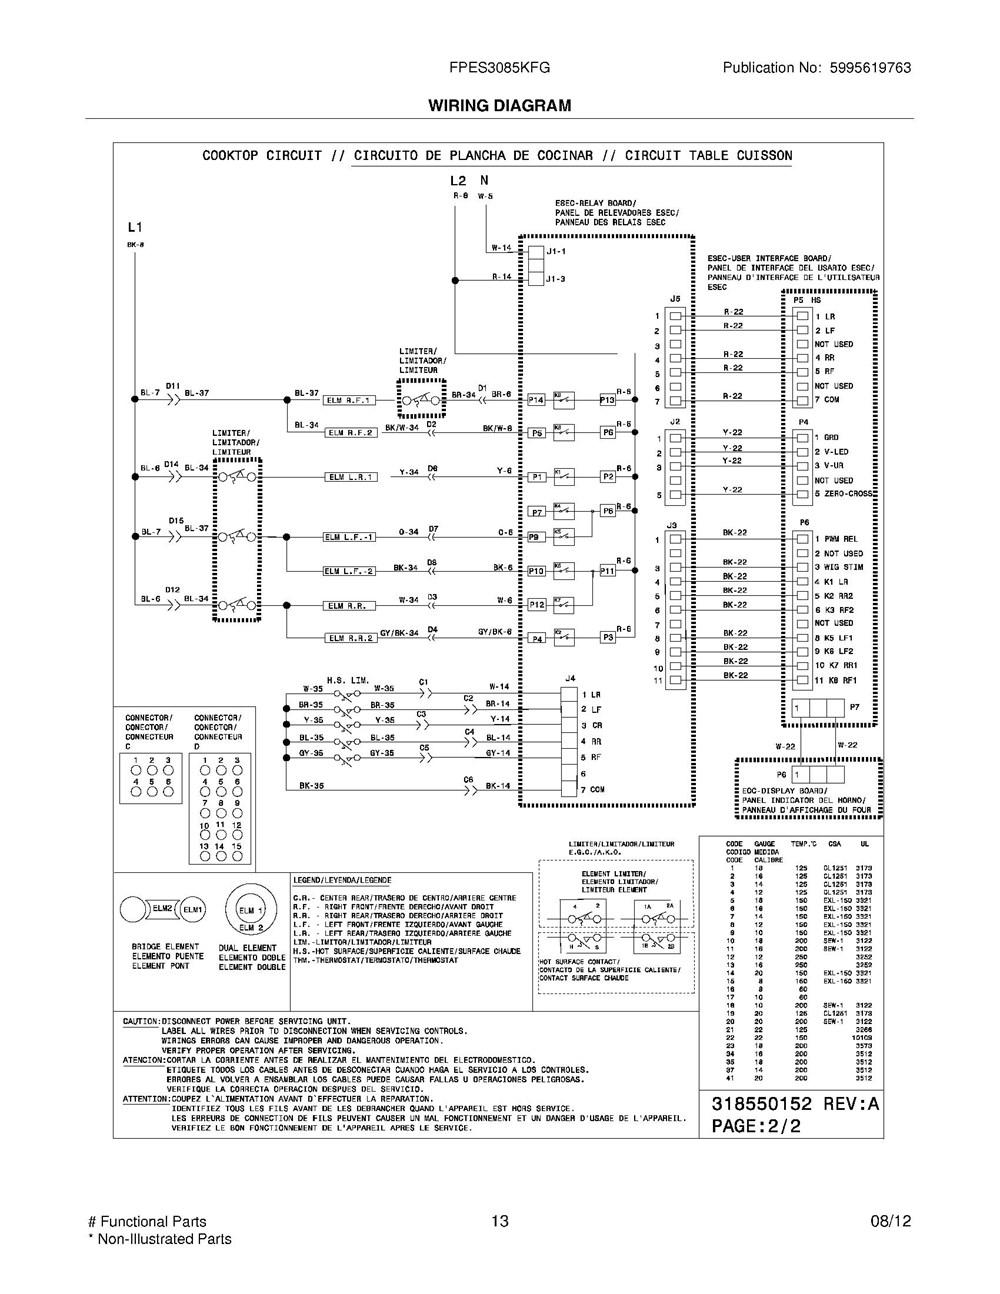 Fpes3085kfg Frigidaire Company Backguard 05body 07top Drawer 09door 01cover 10wiring Diagram